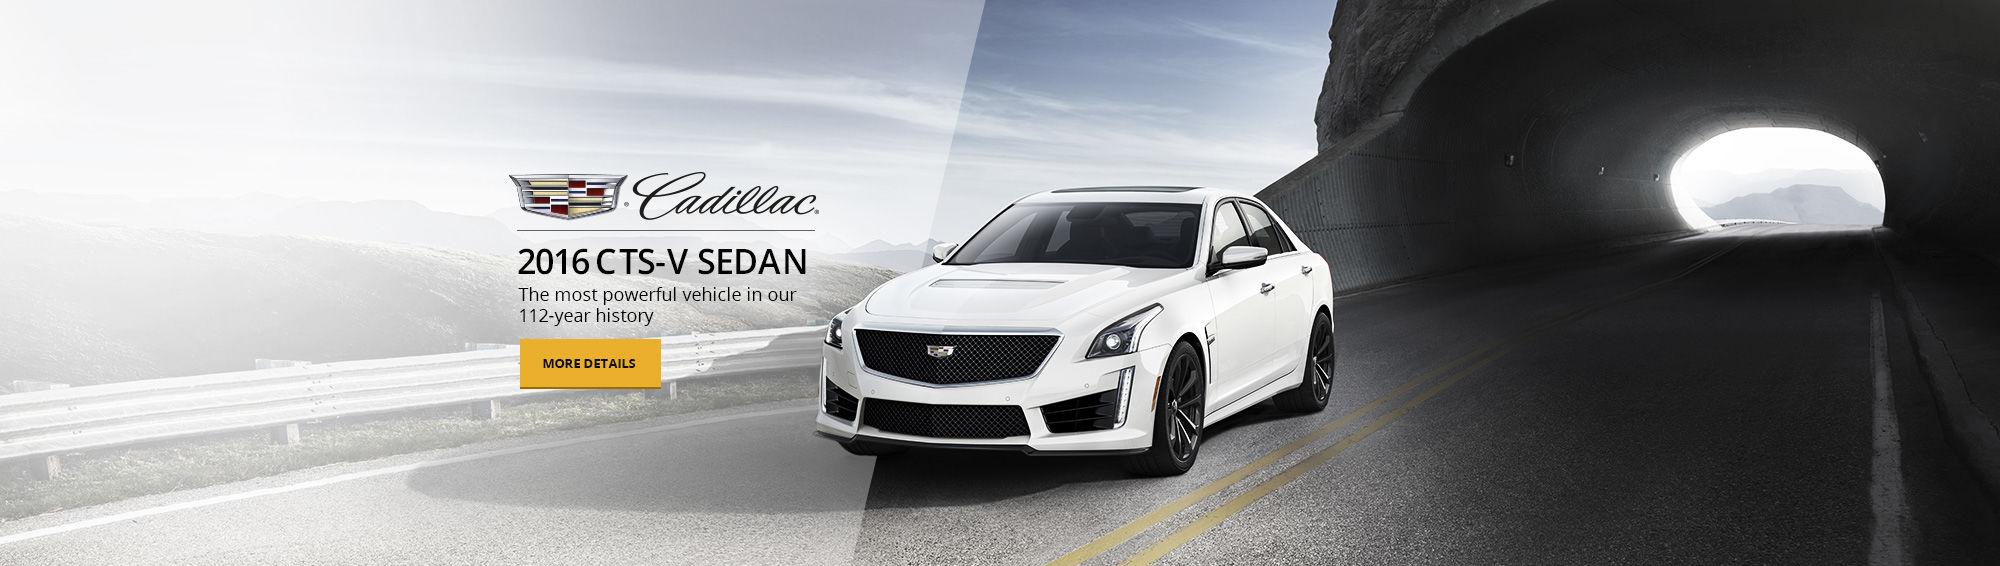 Cadillac - 2016 CTV-S